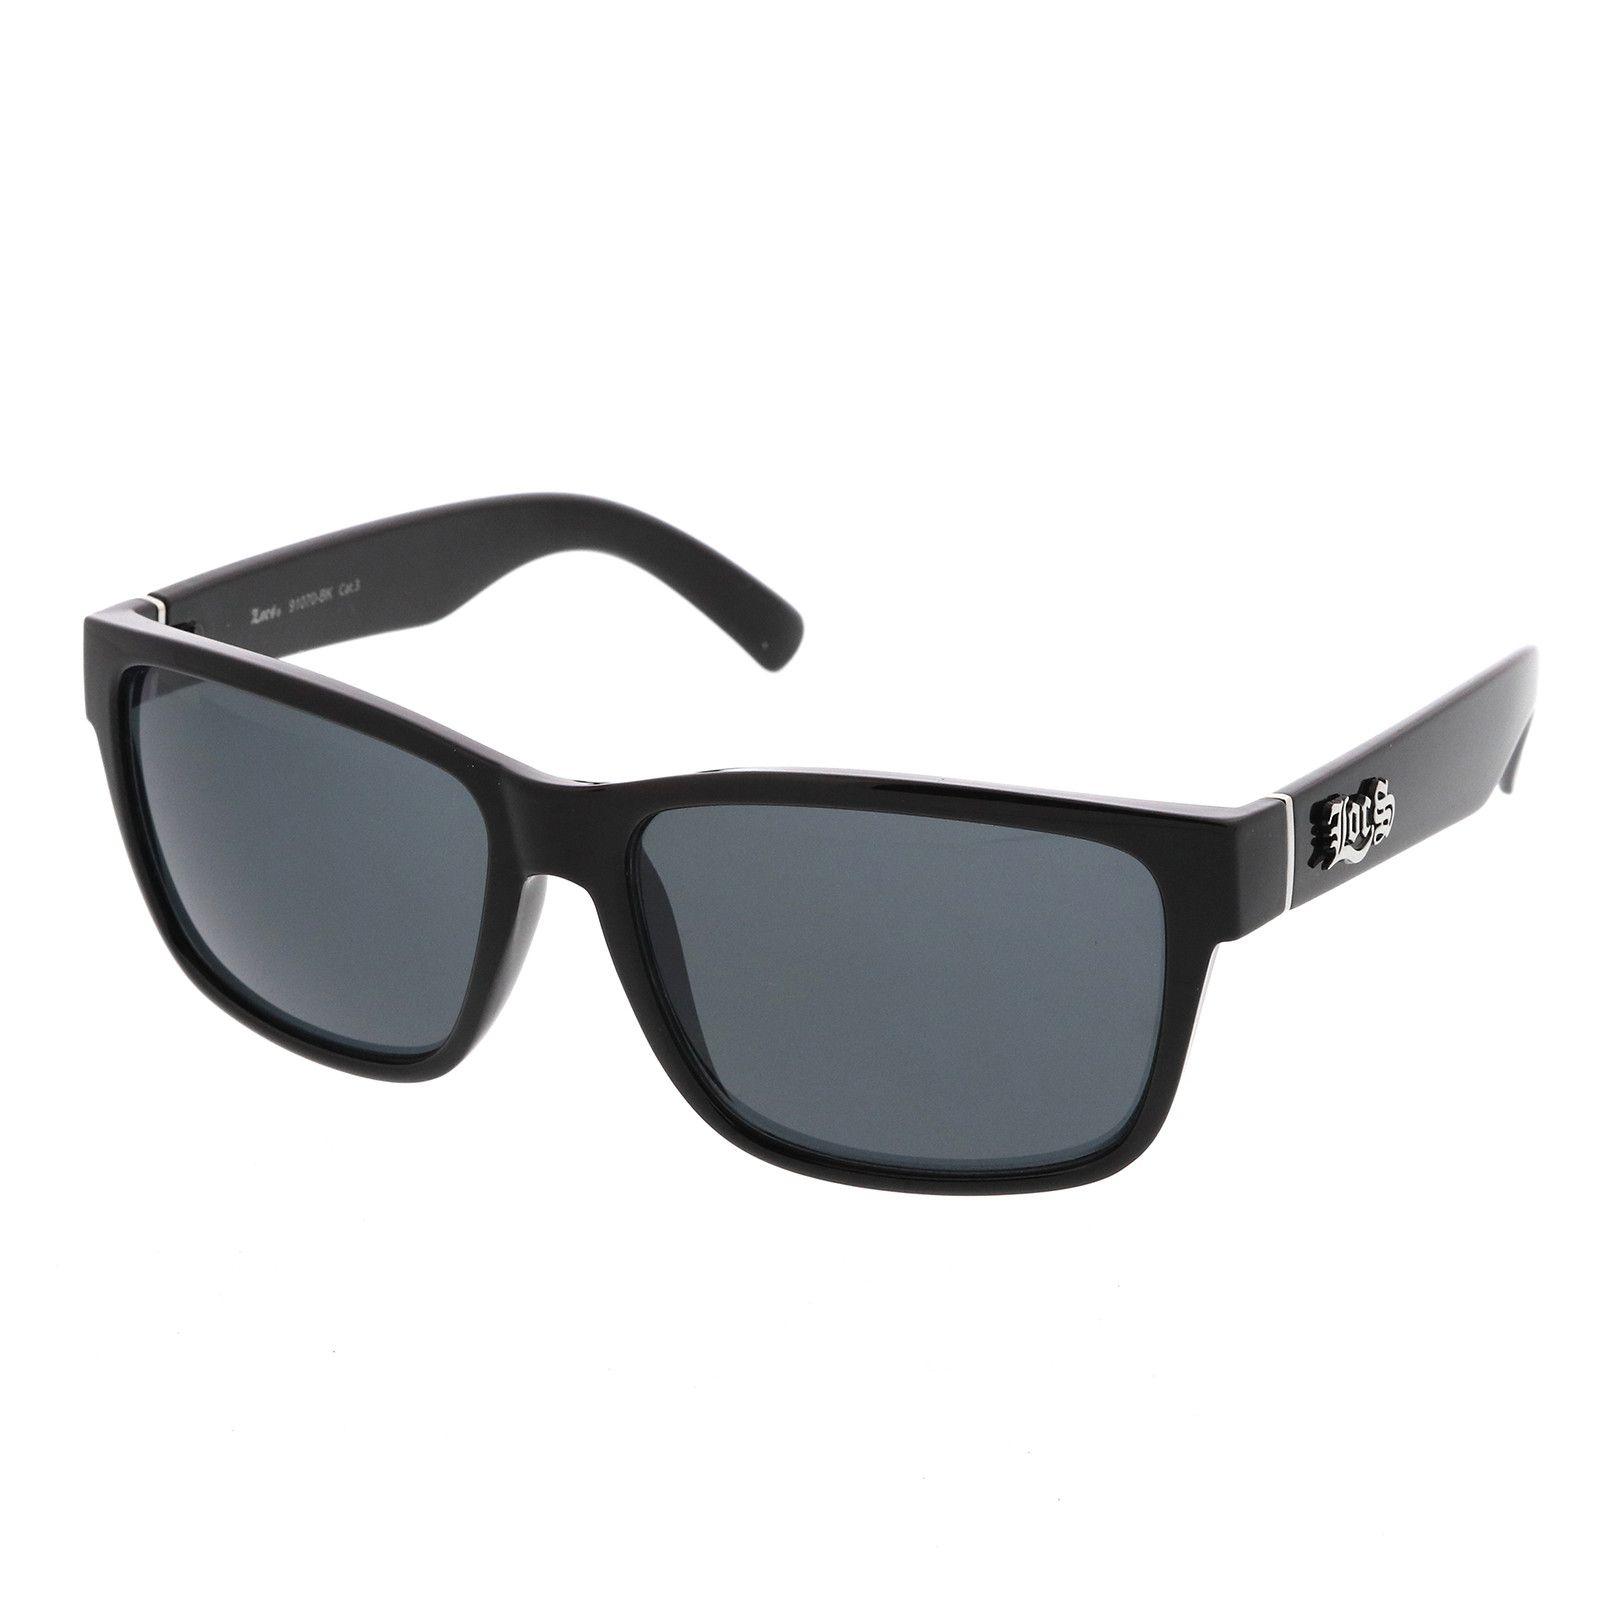 ca3743fbffb Men s OG Hip Hop Wide Arm Blacked Out Square Lens Horn Rimmed LOCS  Sunglasses 60mm  frame  bold  sunglasses  sunglass  purple  sunglassla   oversized  clear ...